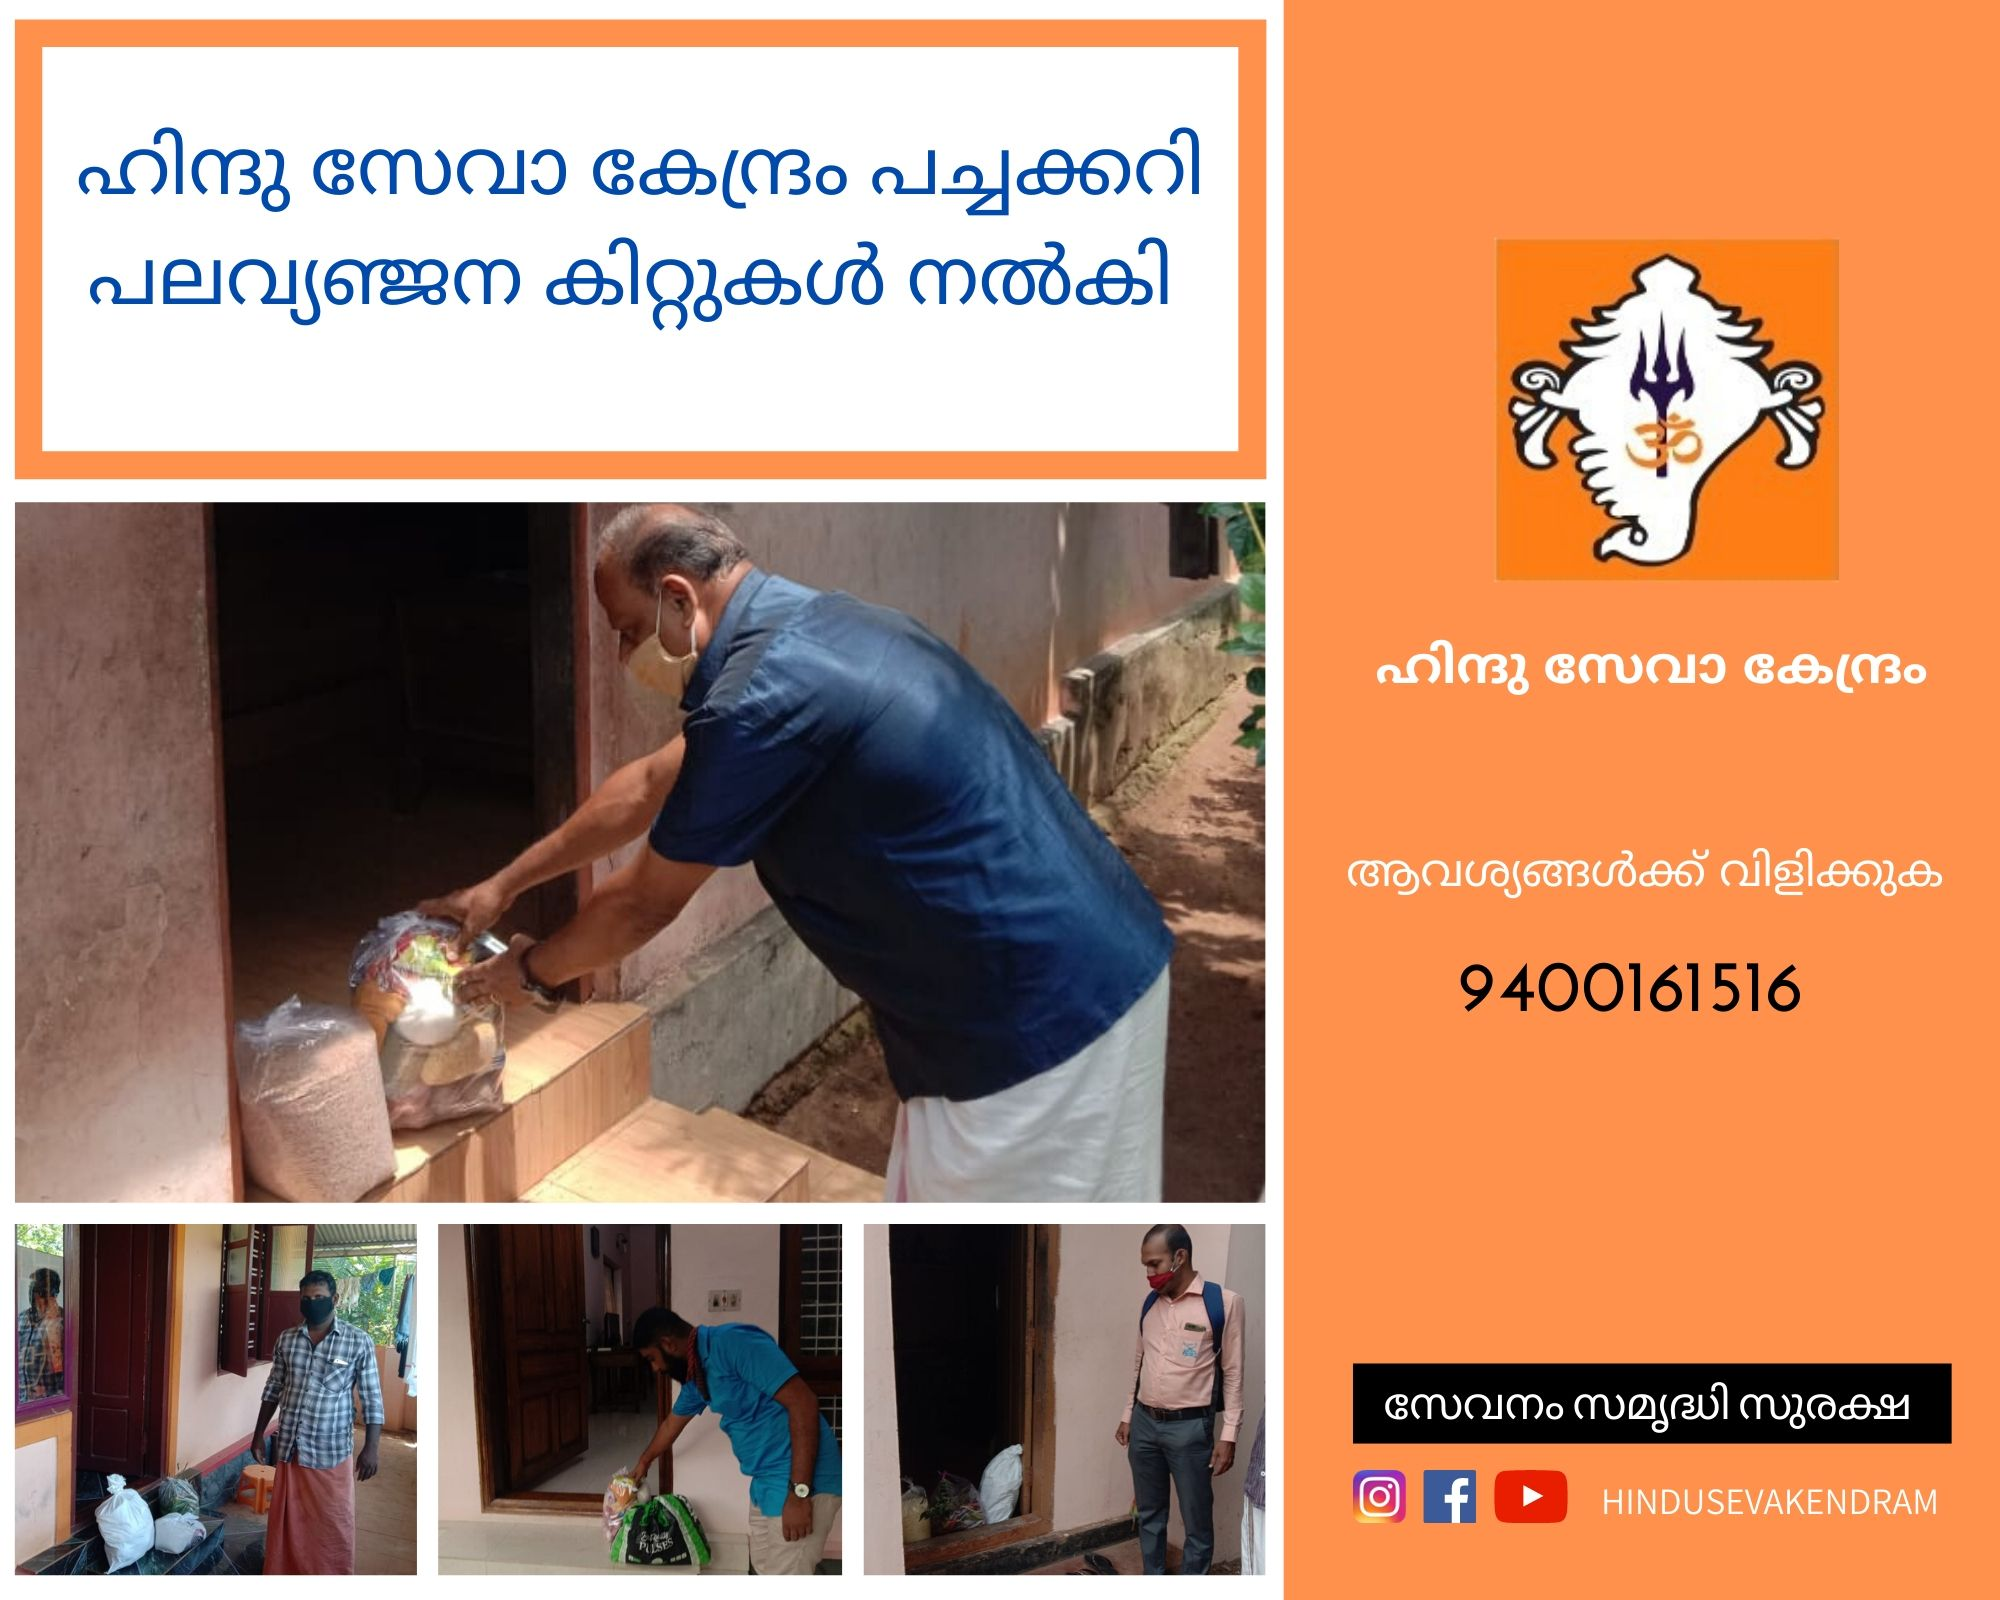 Hindu Seva Kendram distributes vegetable and groceries to families